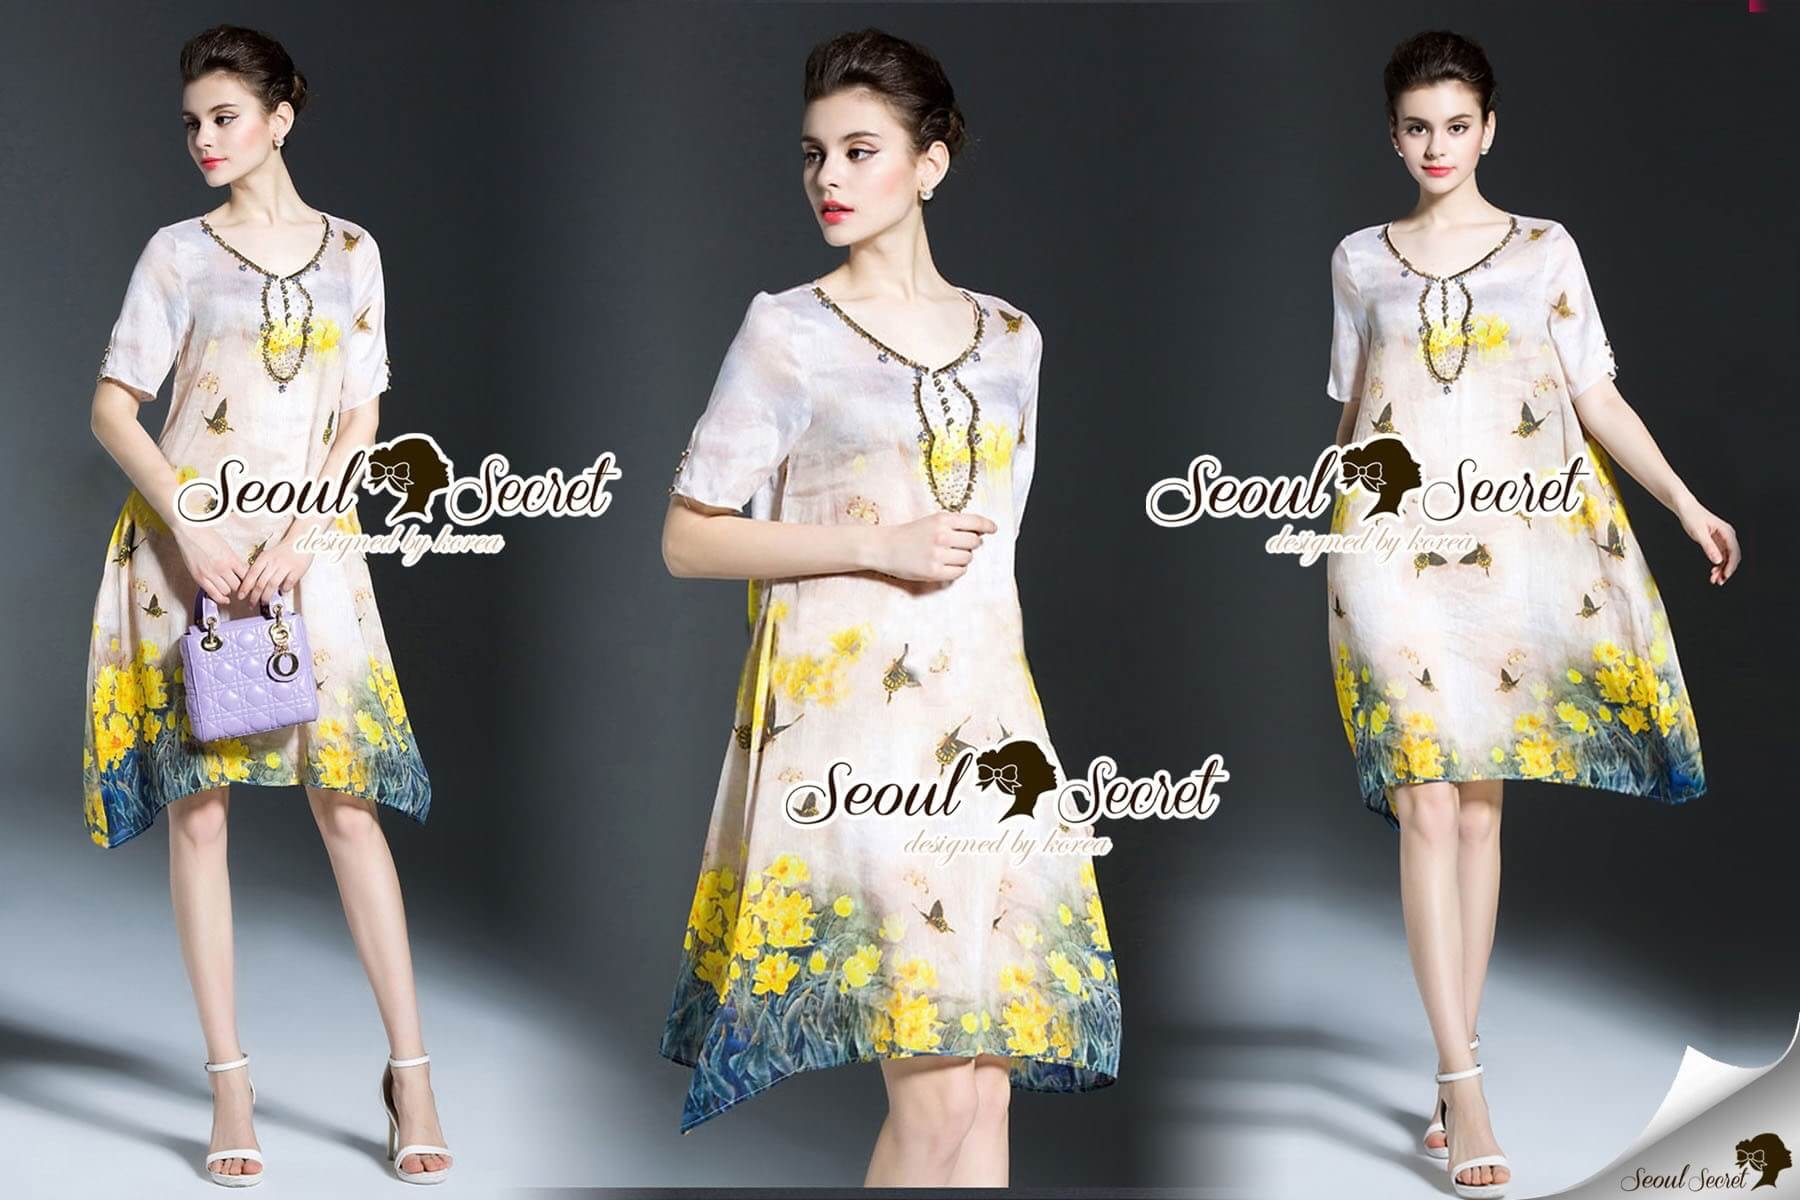 Seoul Secret Say's... Vintage Yellow Blossom Print Dress